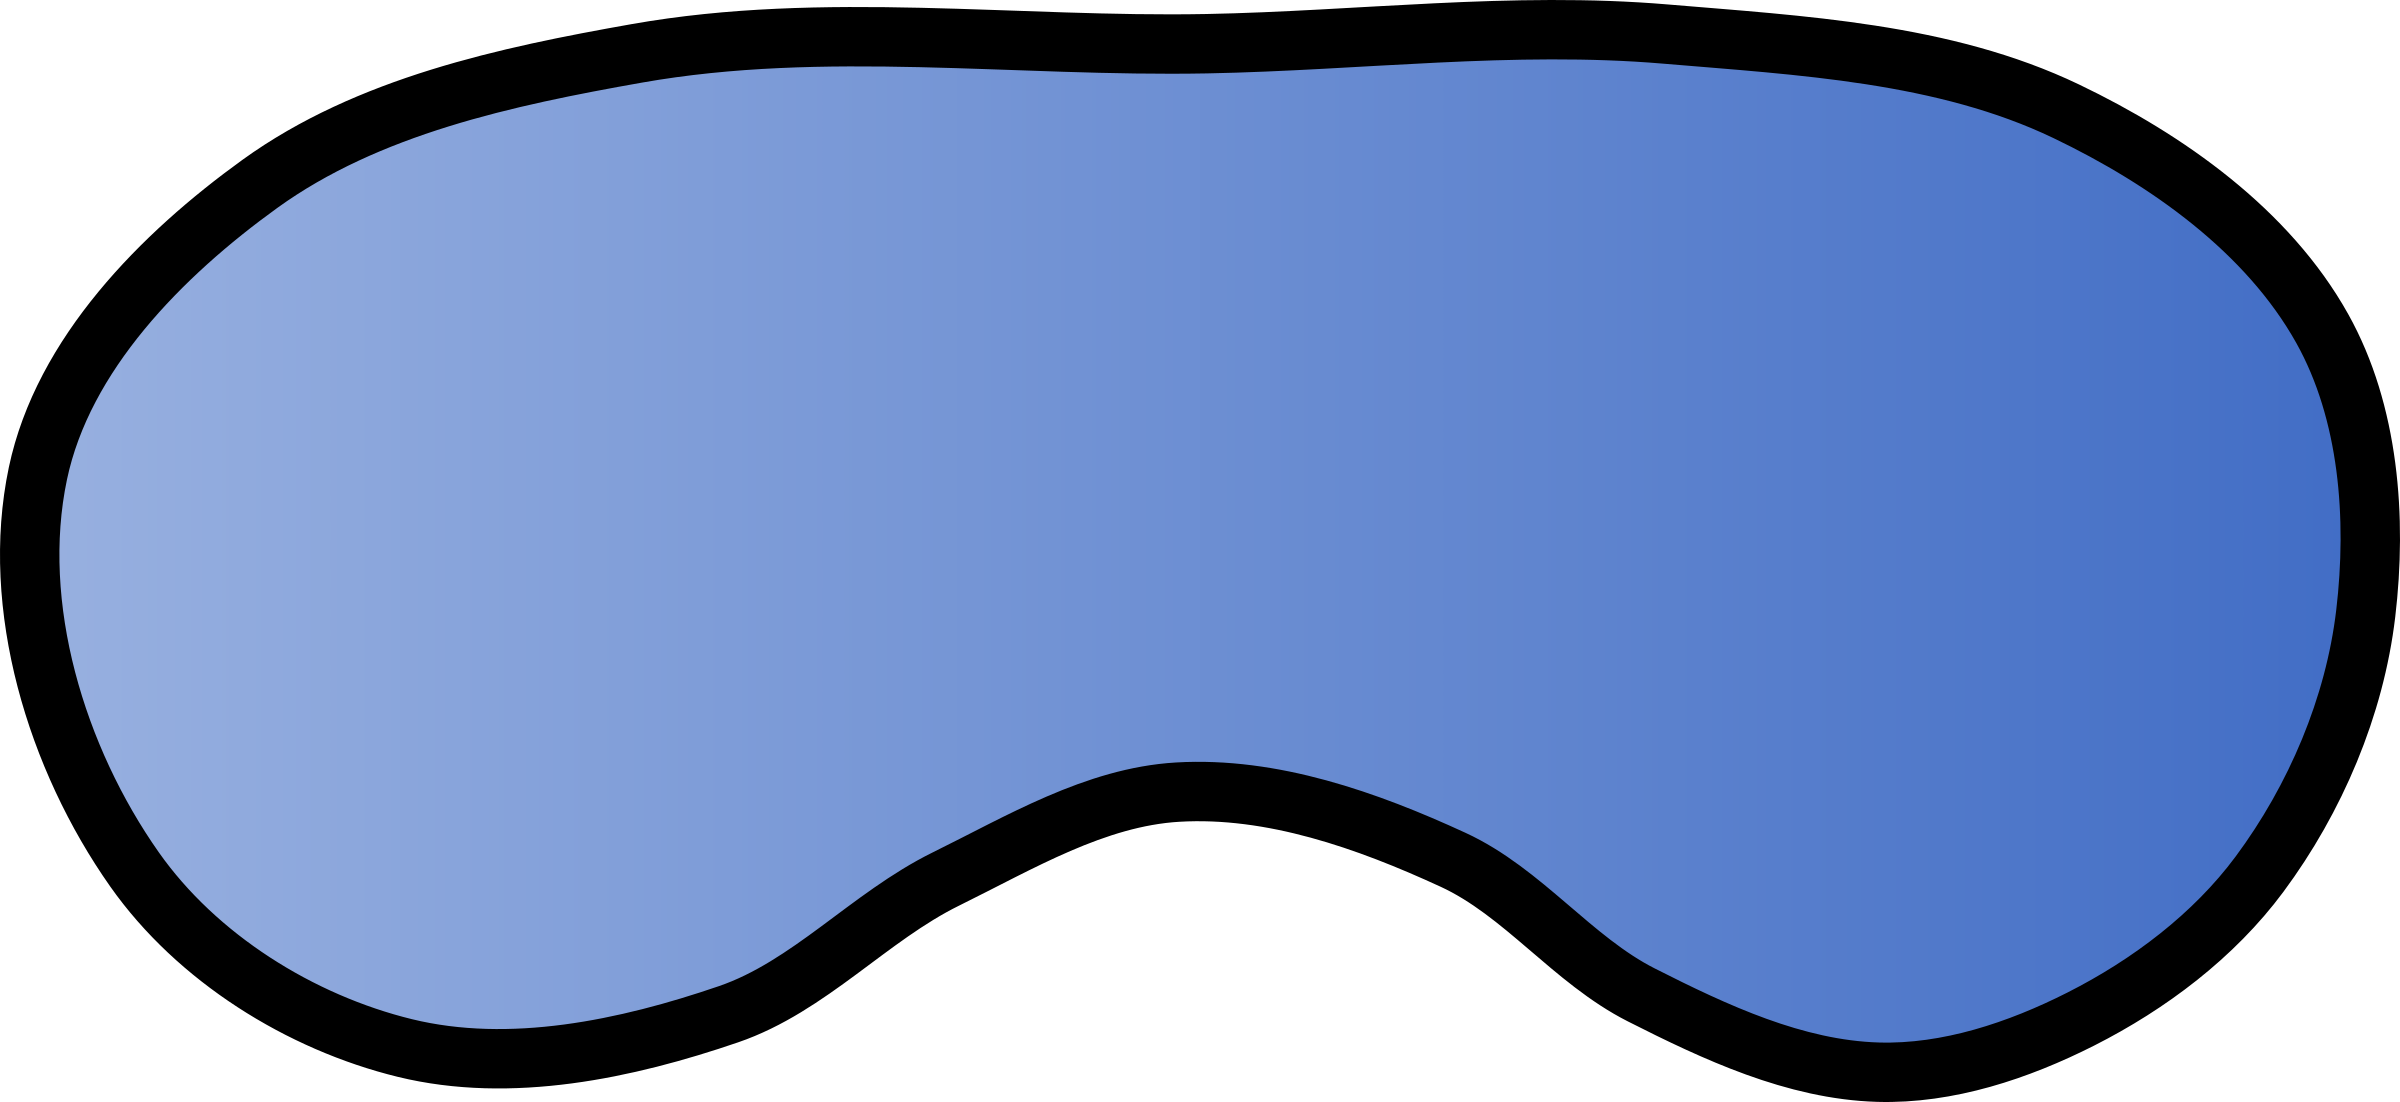 Eye Mask Clipart.